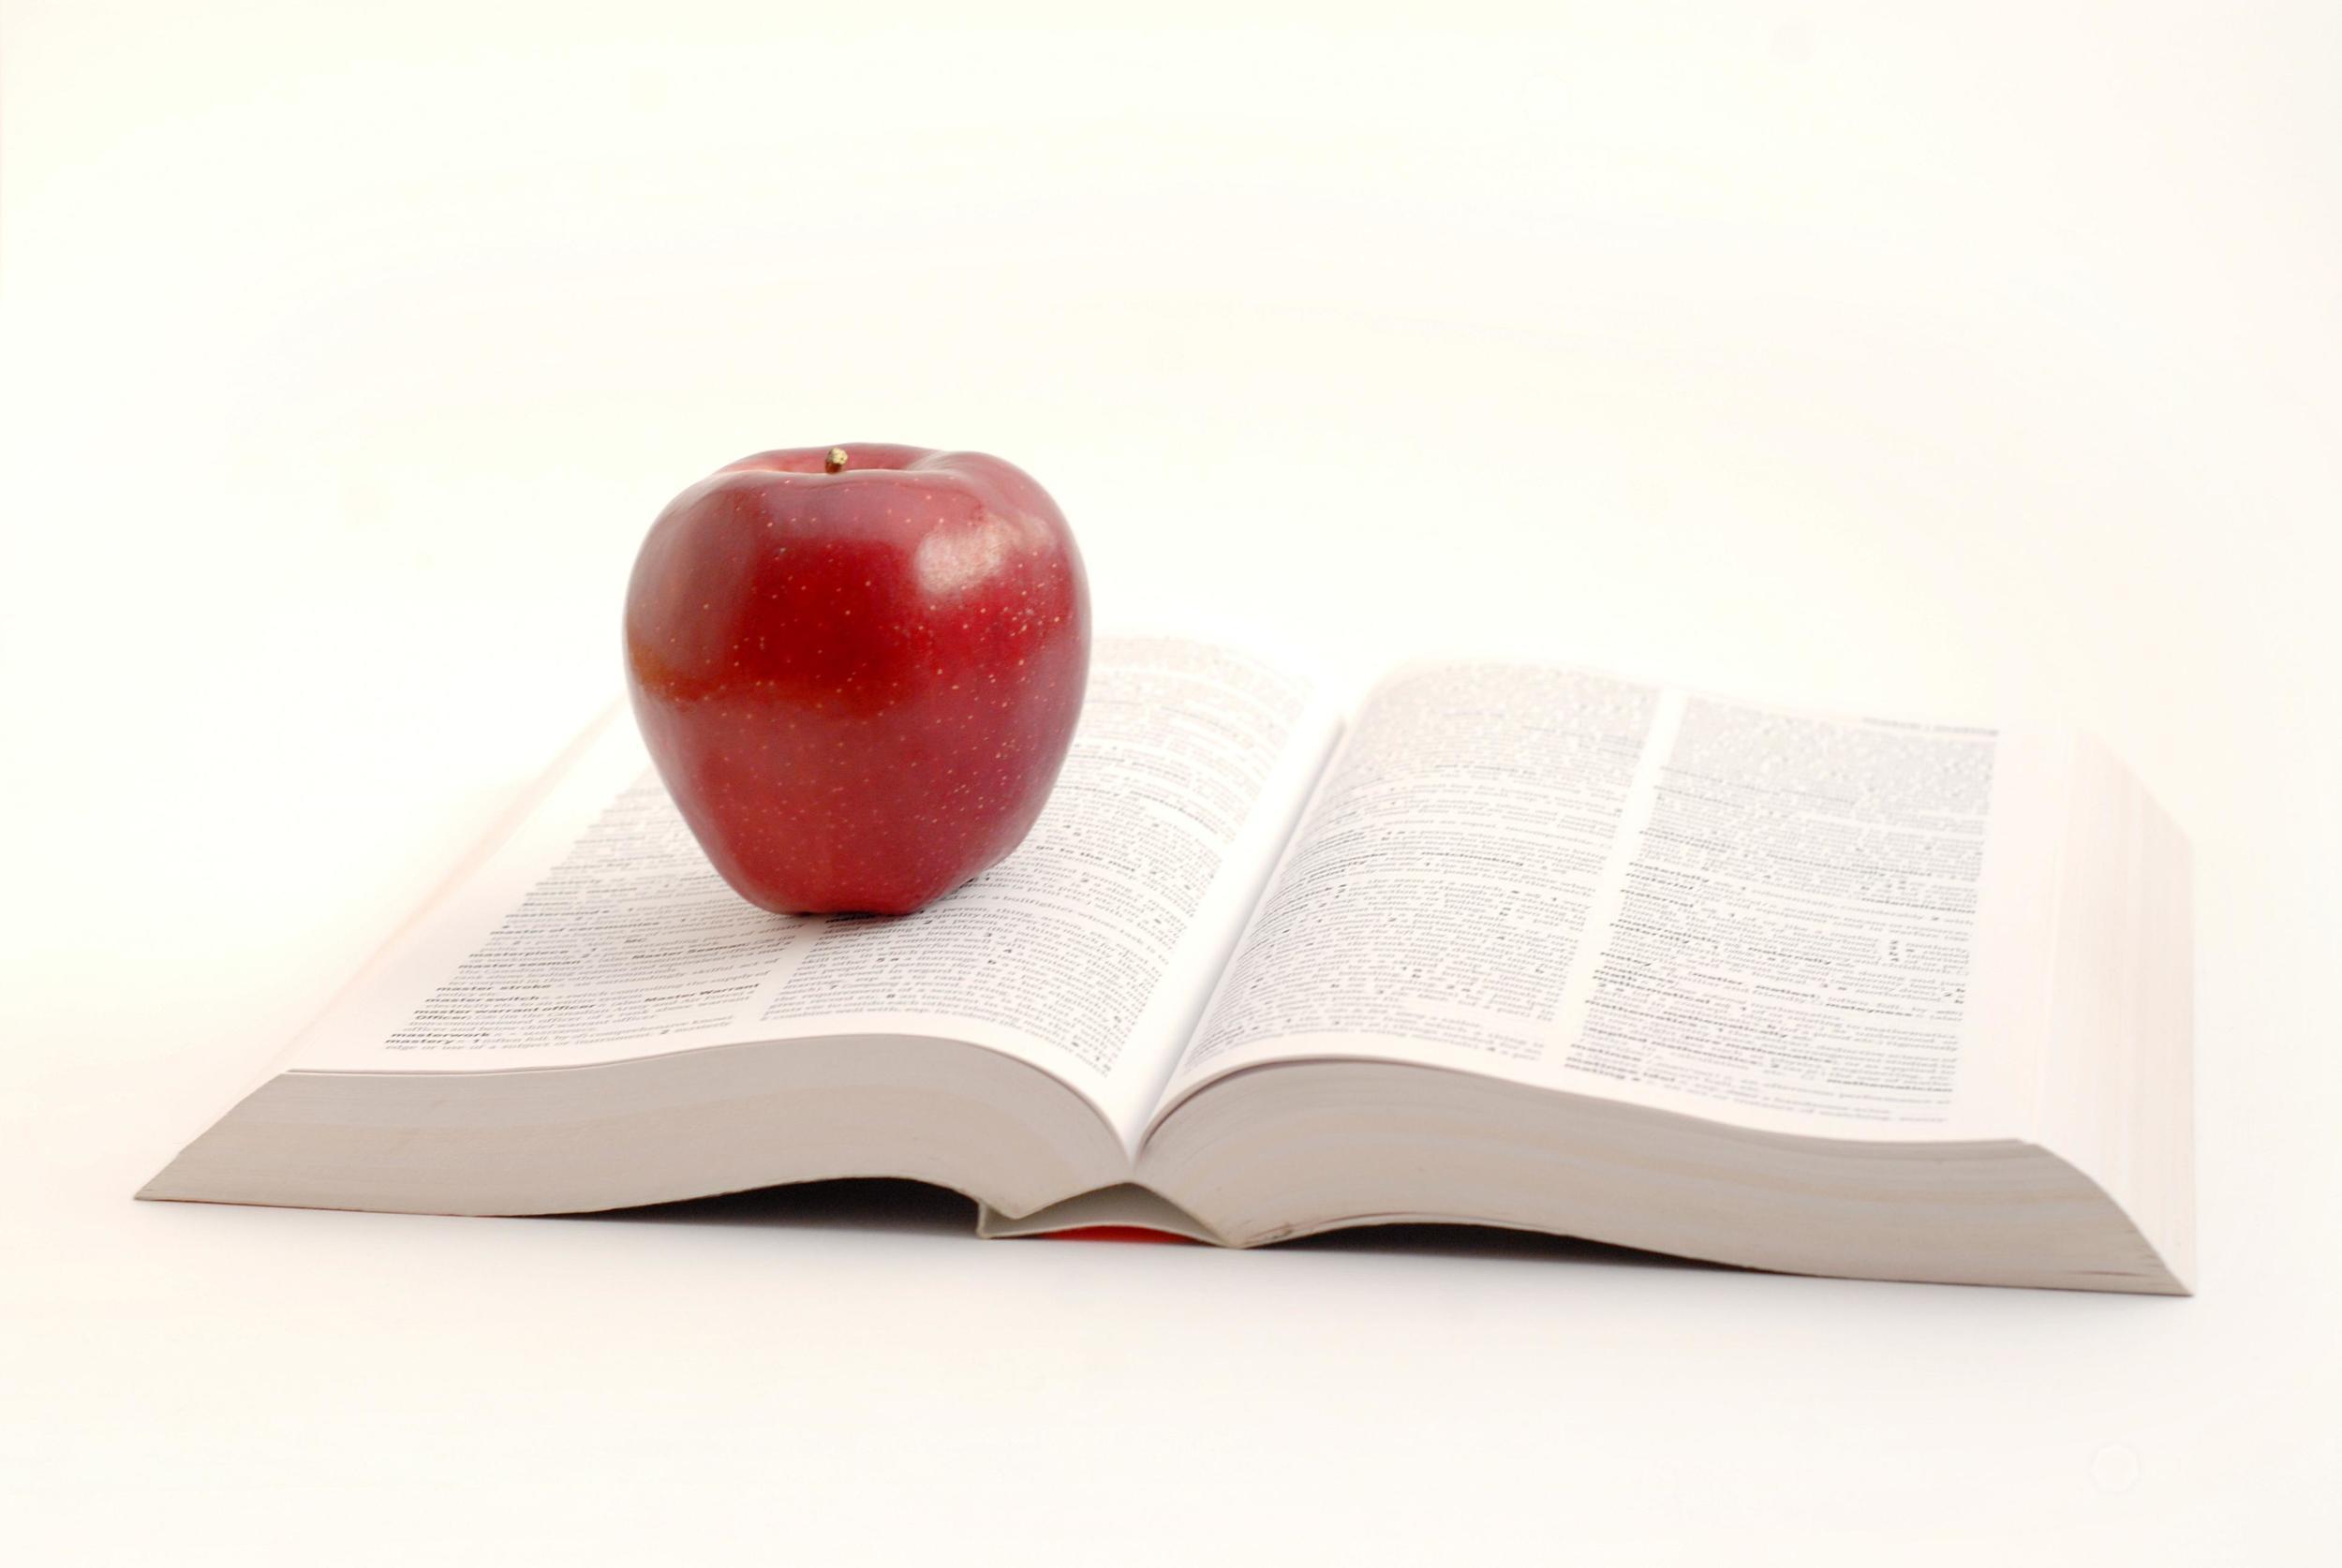 apple-dictionary.jpg